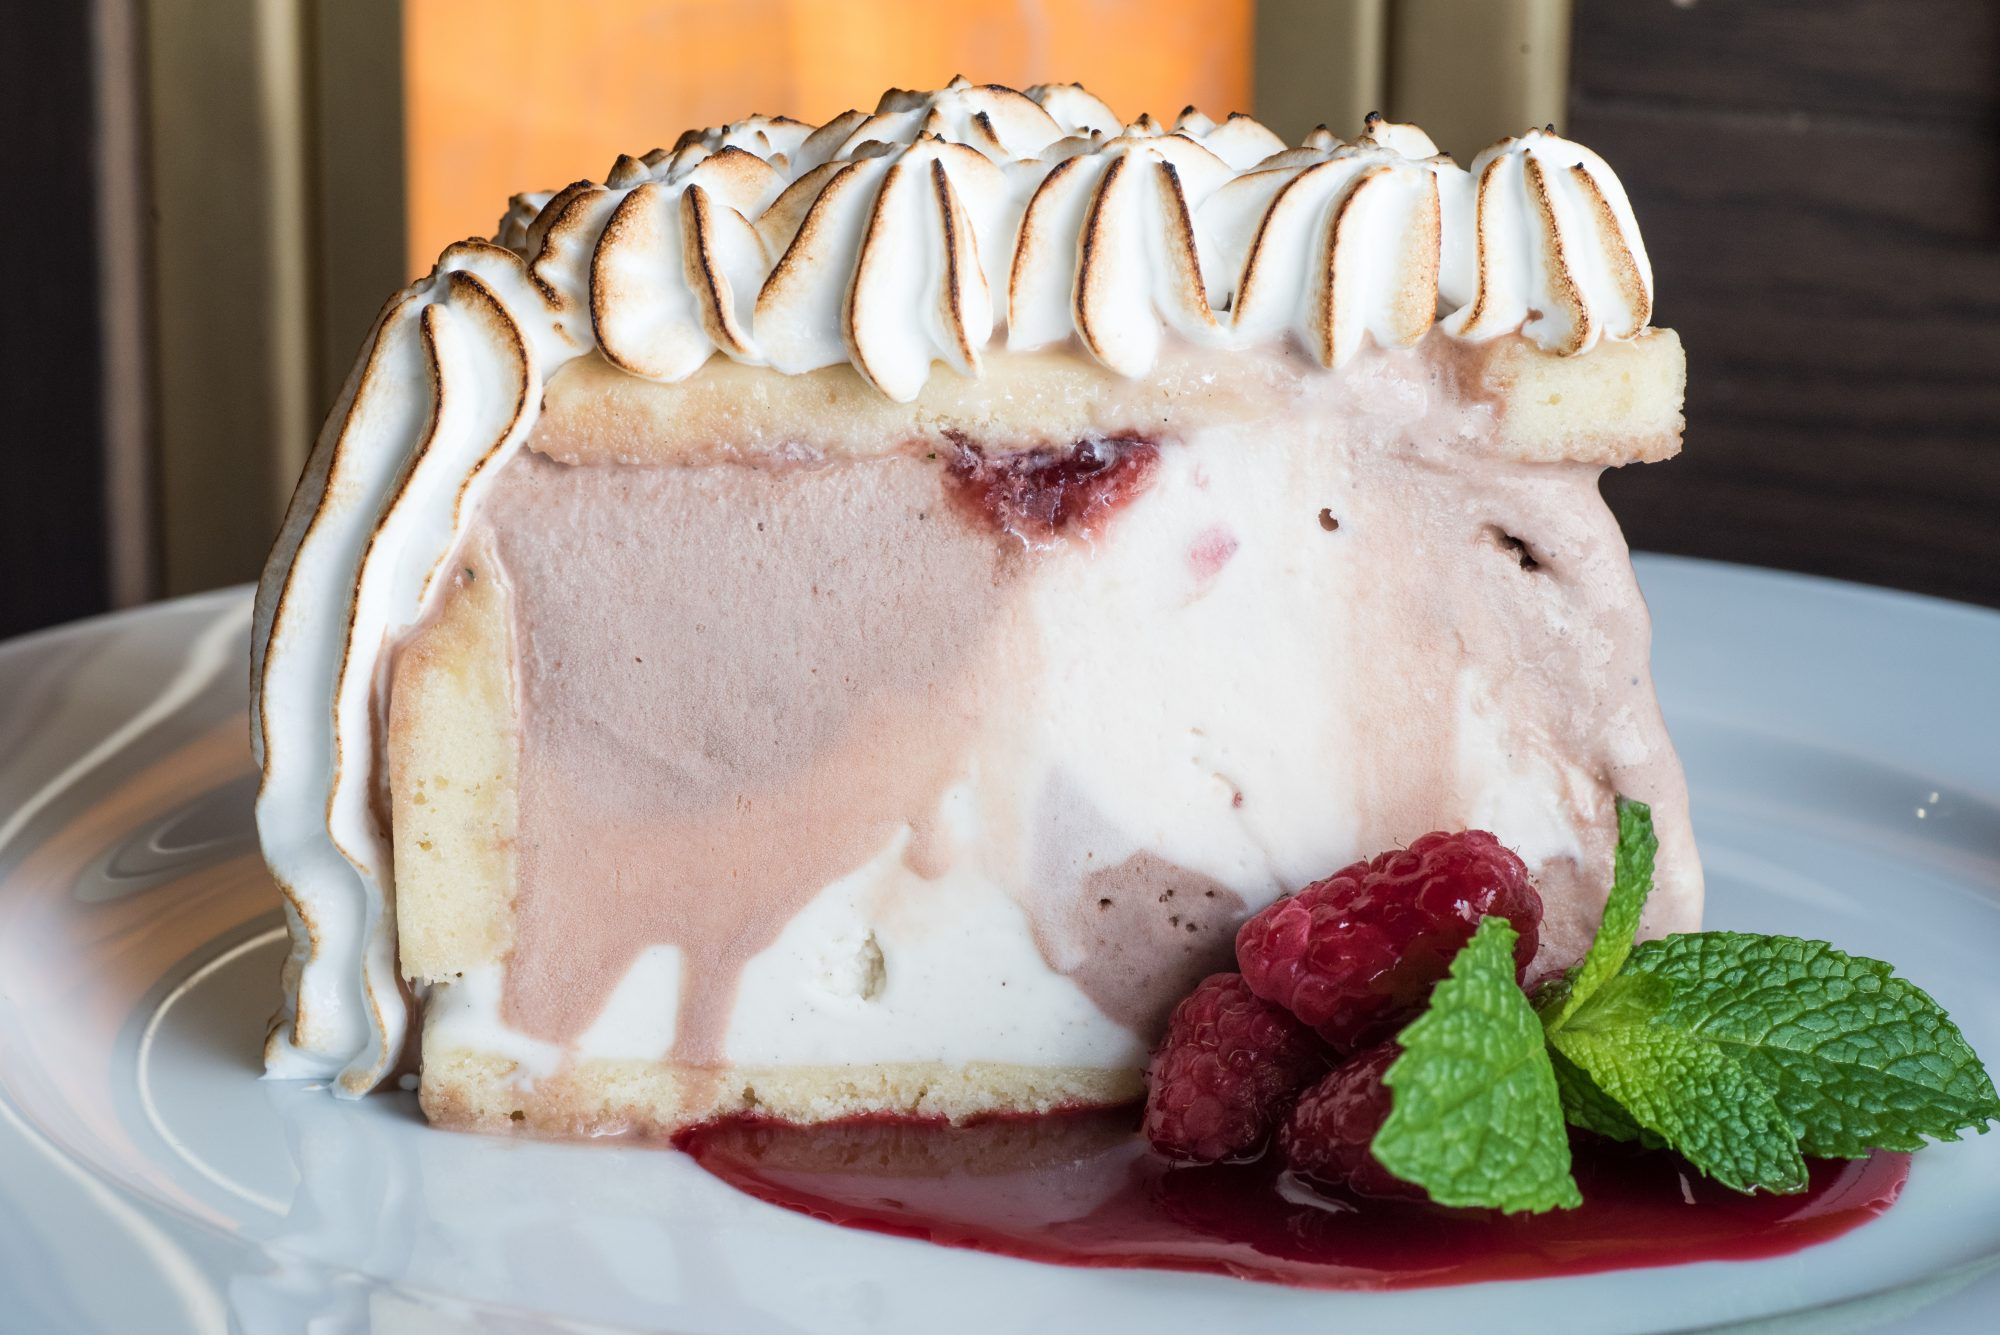 Baked Alaska pound cake Getty 8/12/20